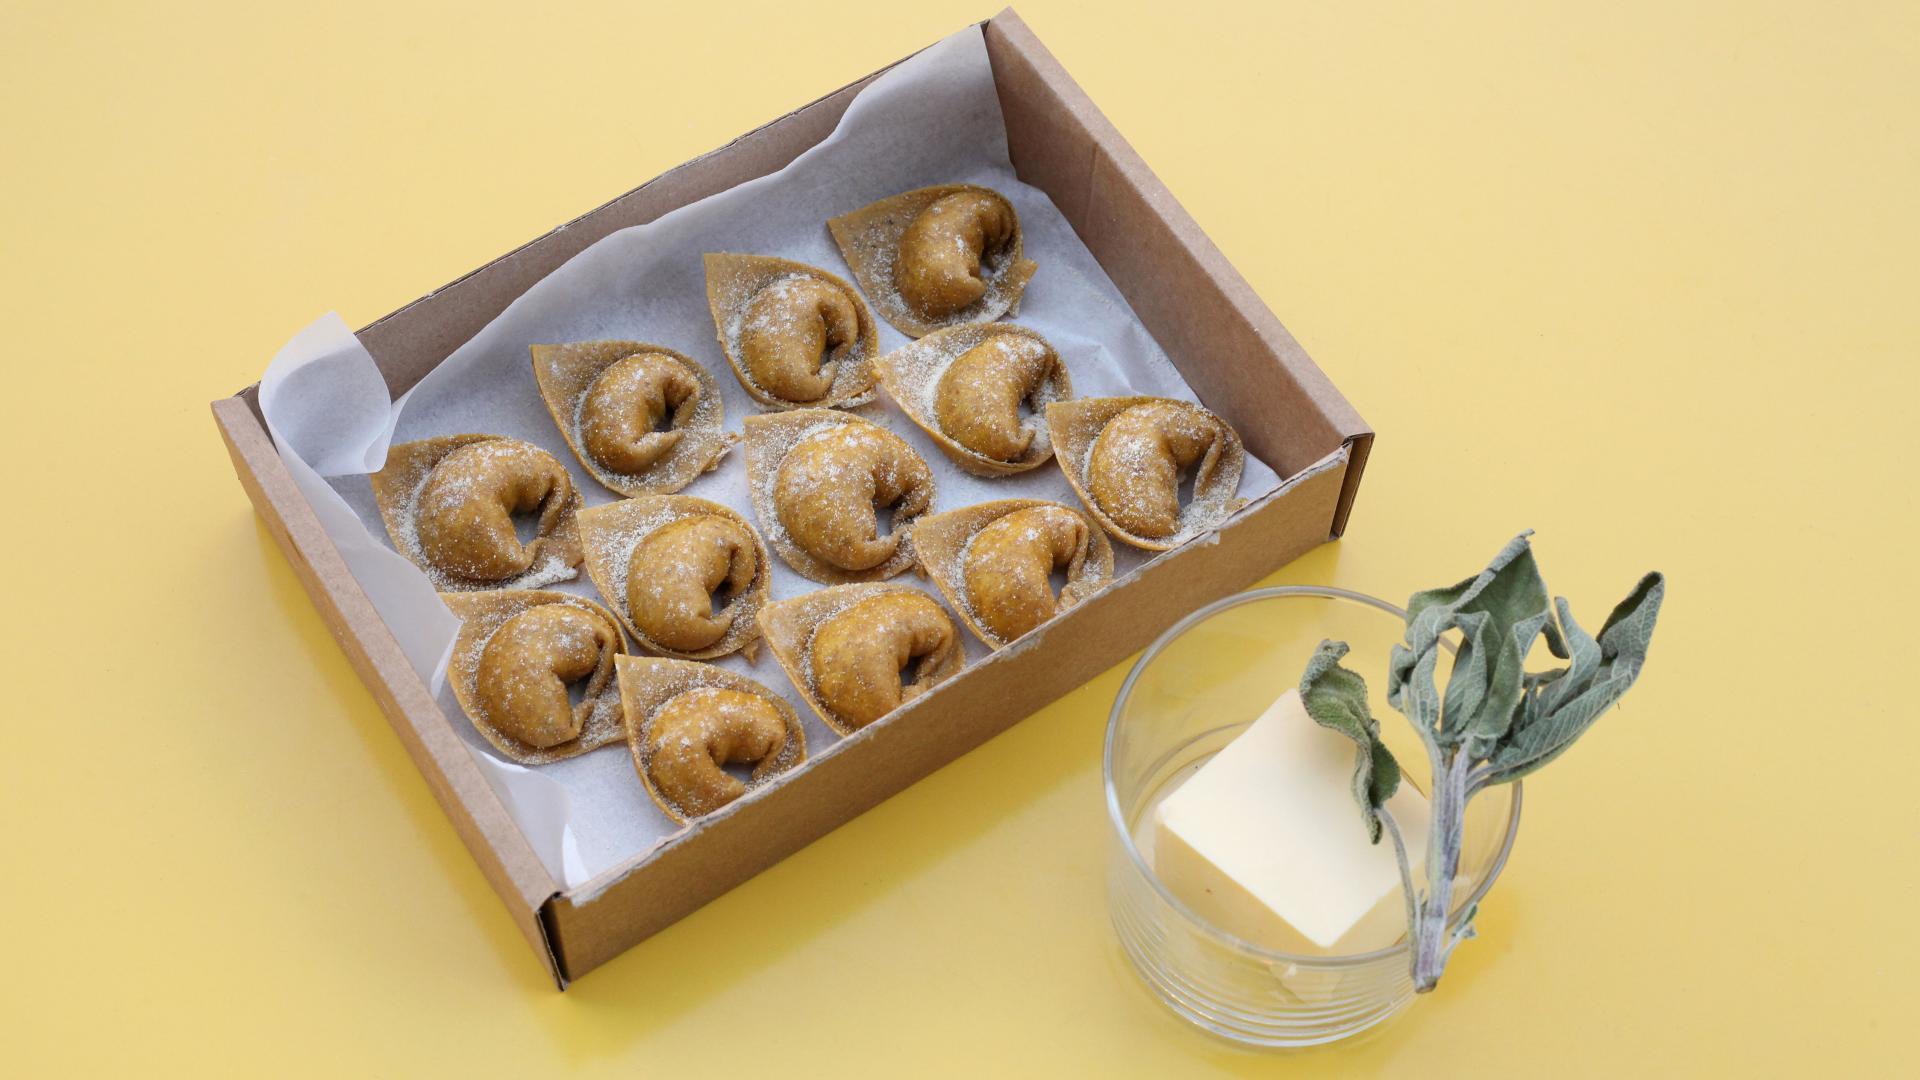 Restaurant meal kits: Burro e Savlia x Wildfarmed Grain fresh pasta kit